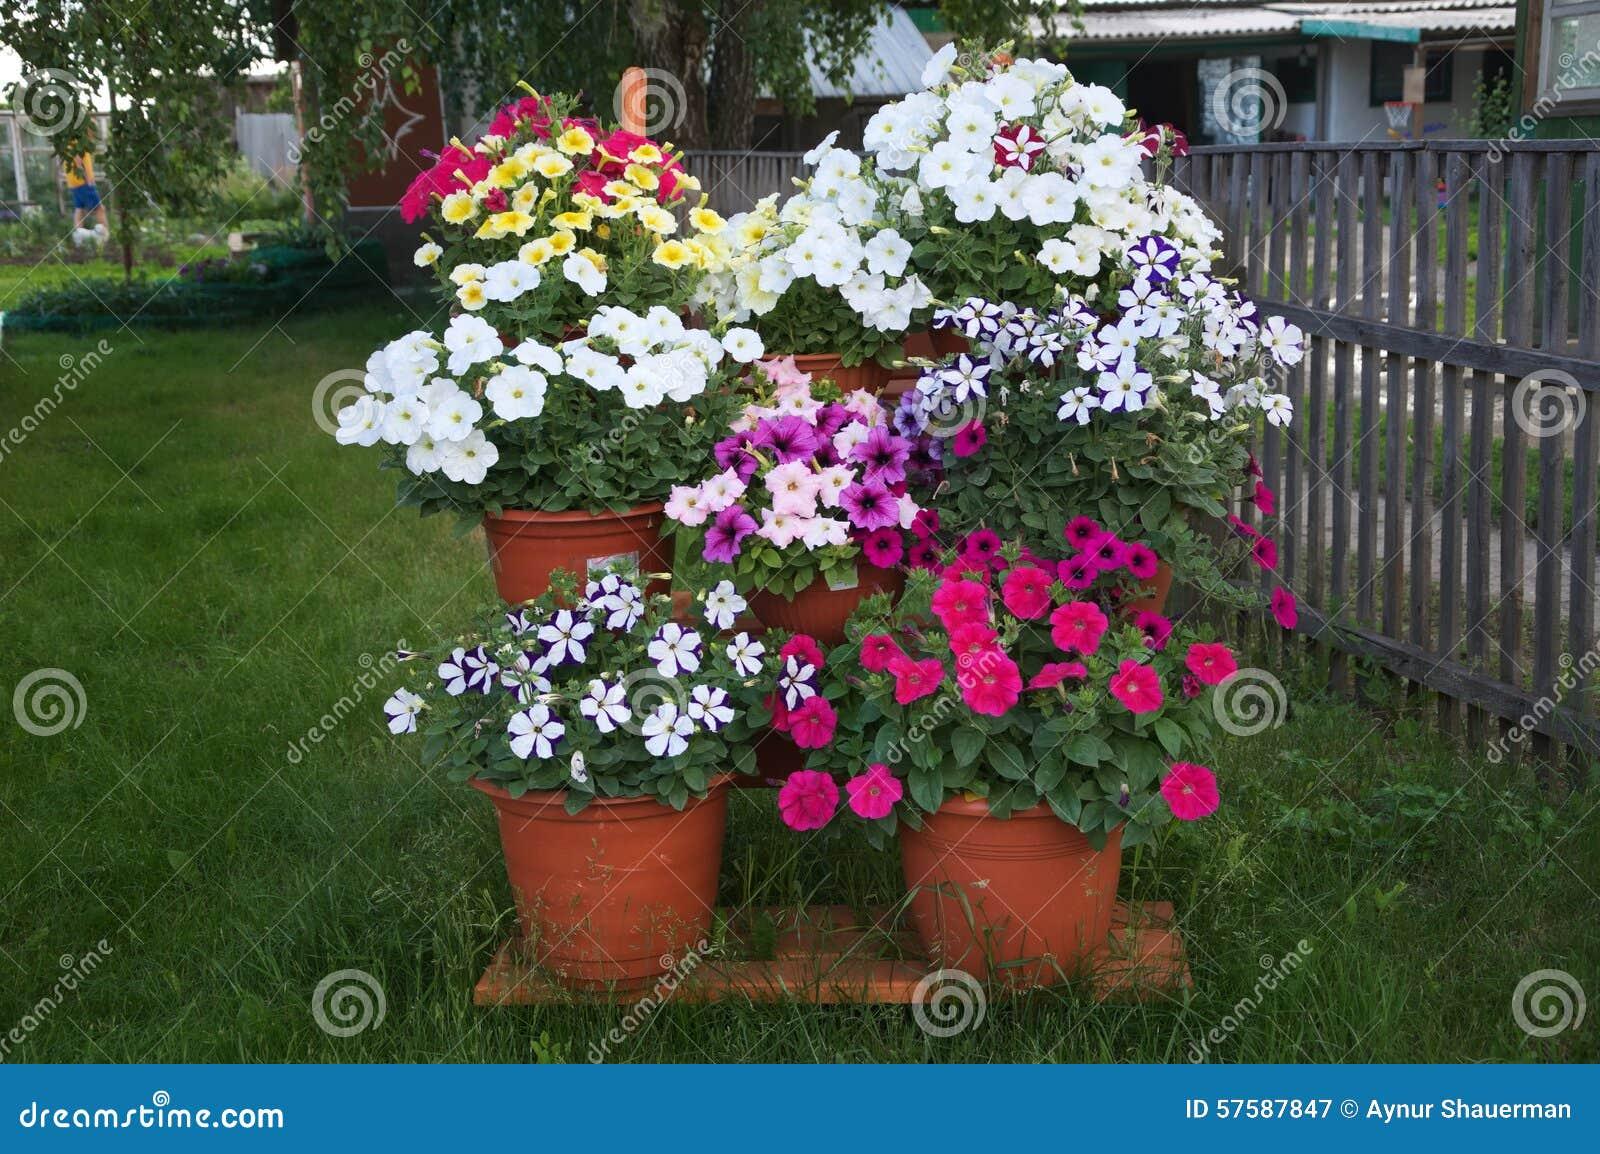 Stair decoration design petunia flower garden stock image for Arreglar un jardin abandonado